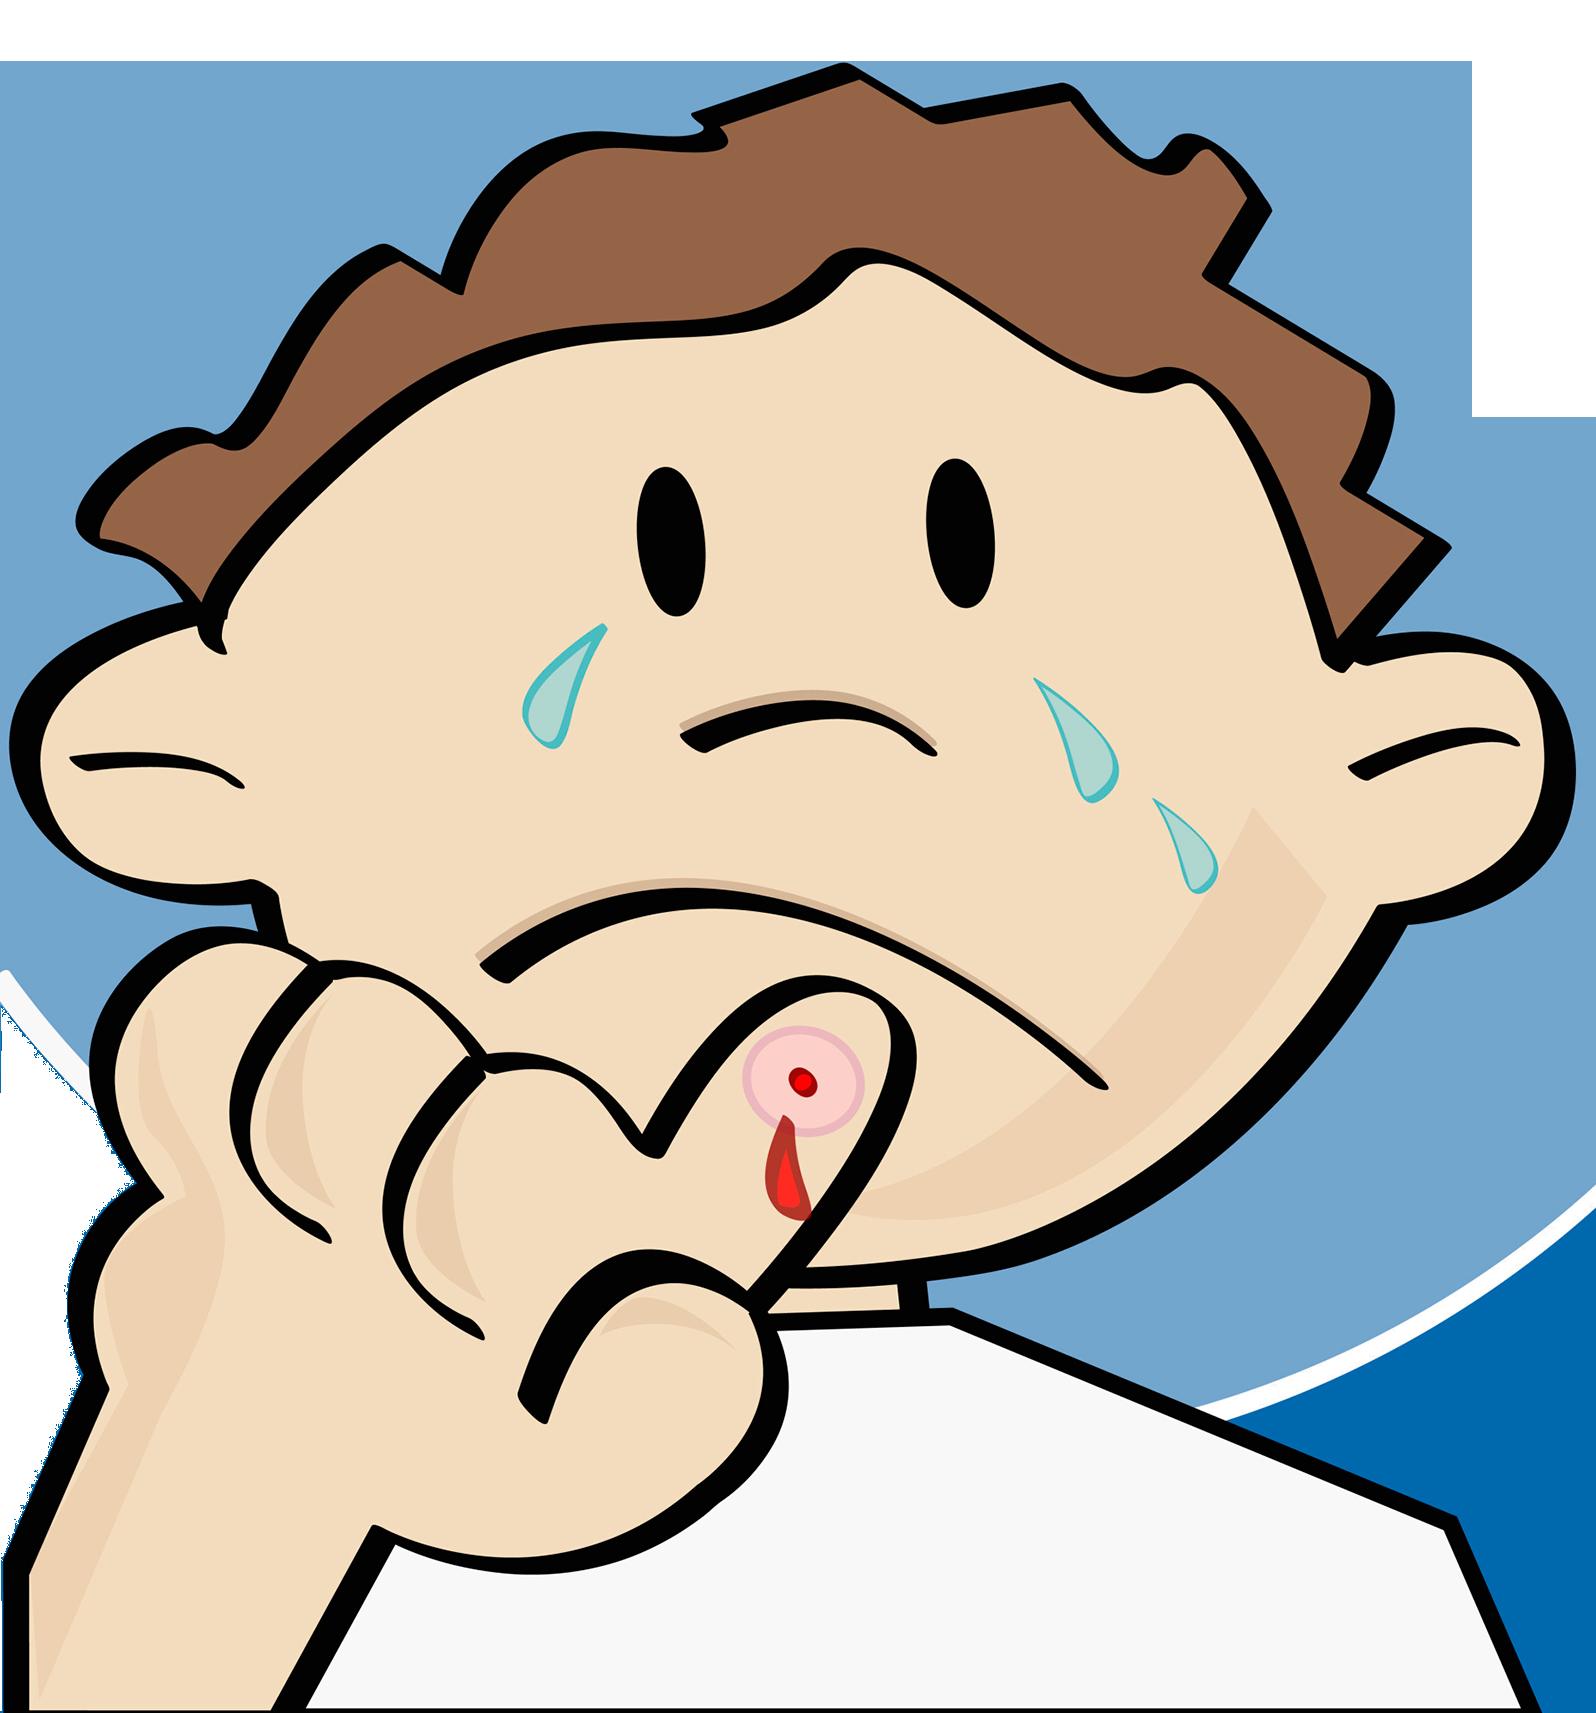 Injury clipart bumped head. Crying cartoon illustration child